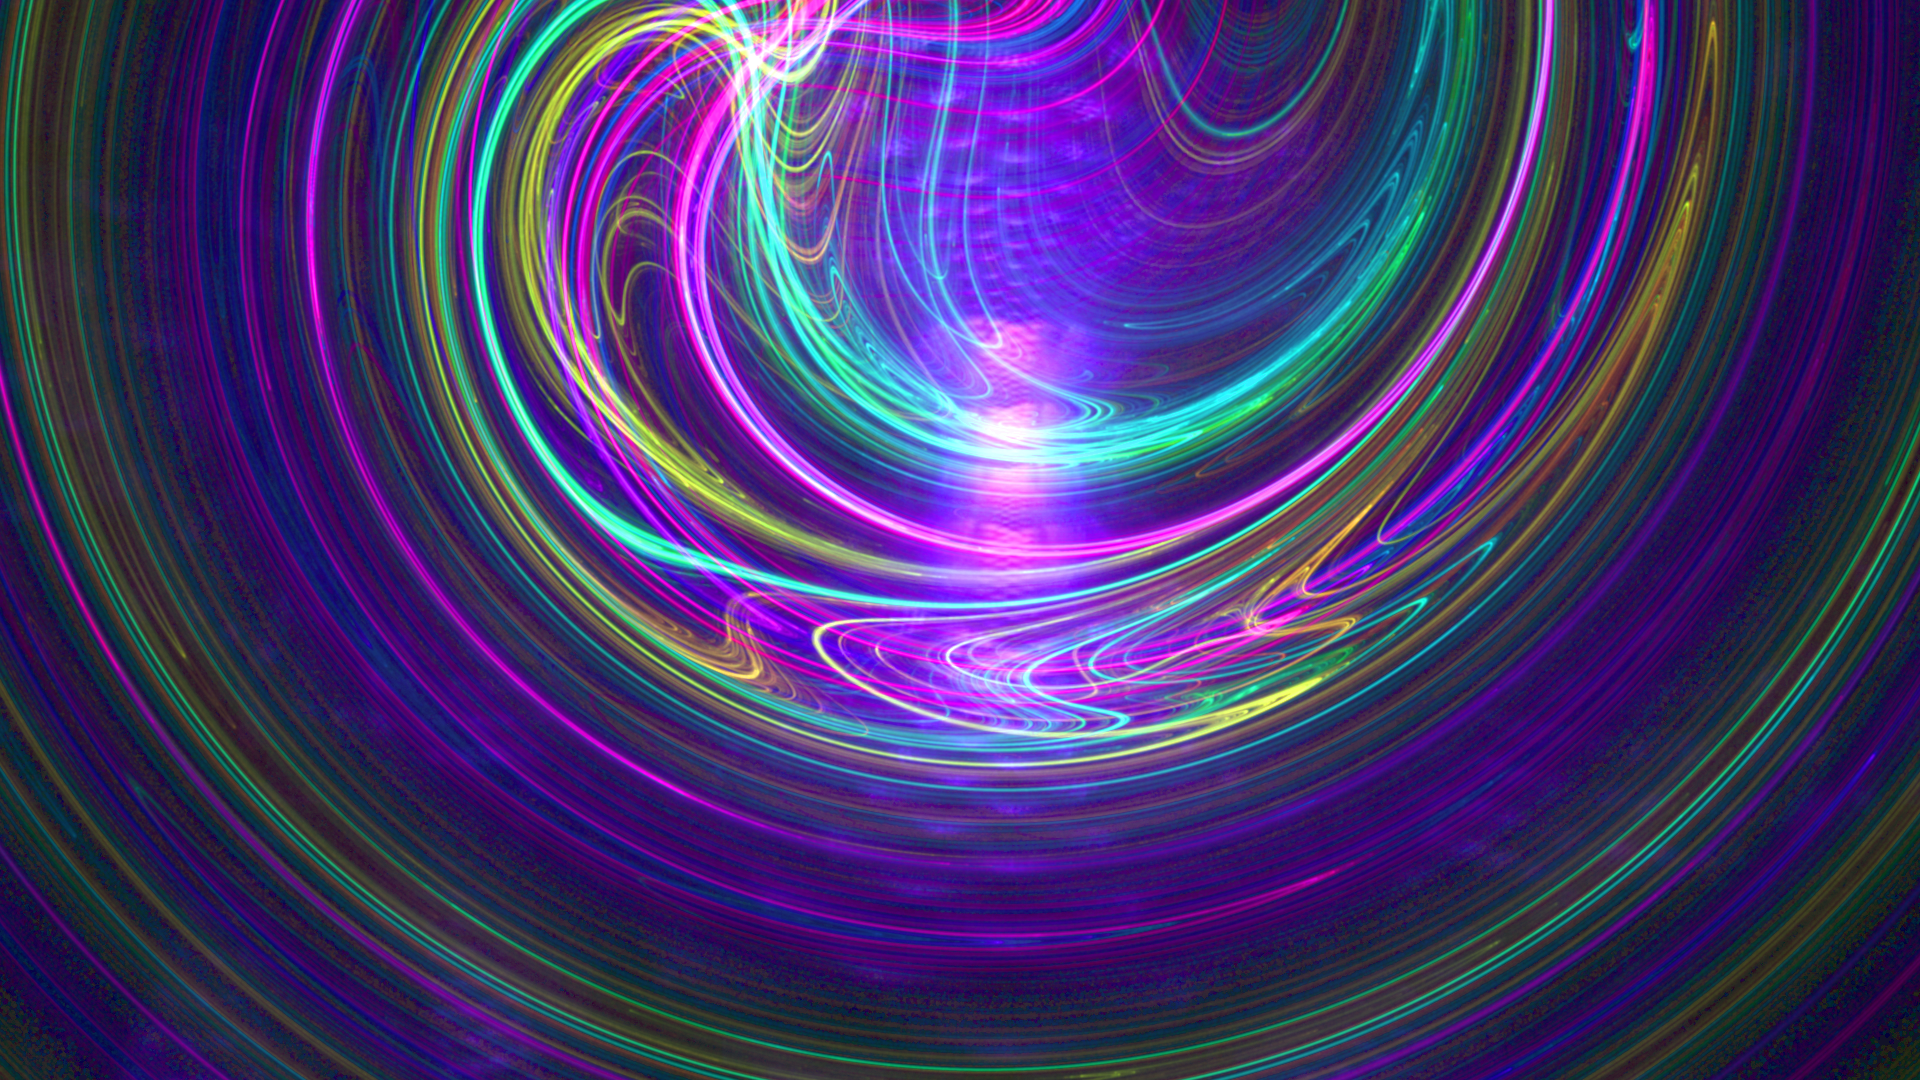 Hd Fractals Wallpapers 1080p: Purple Fractal HD Wallpaper